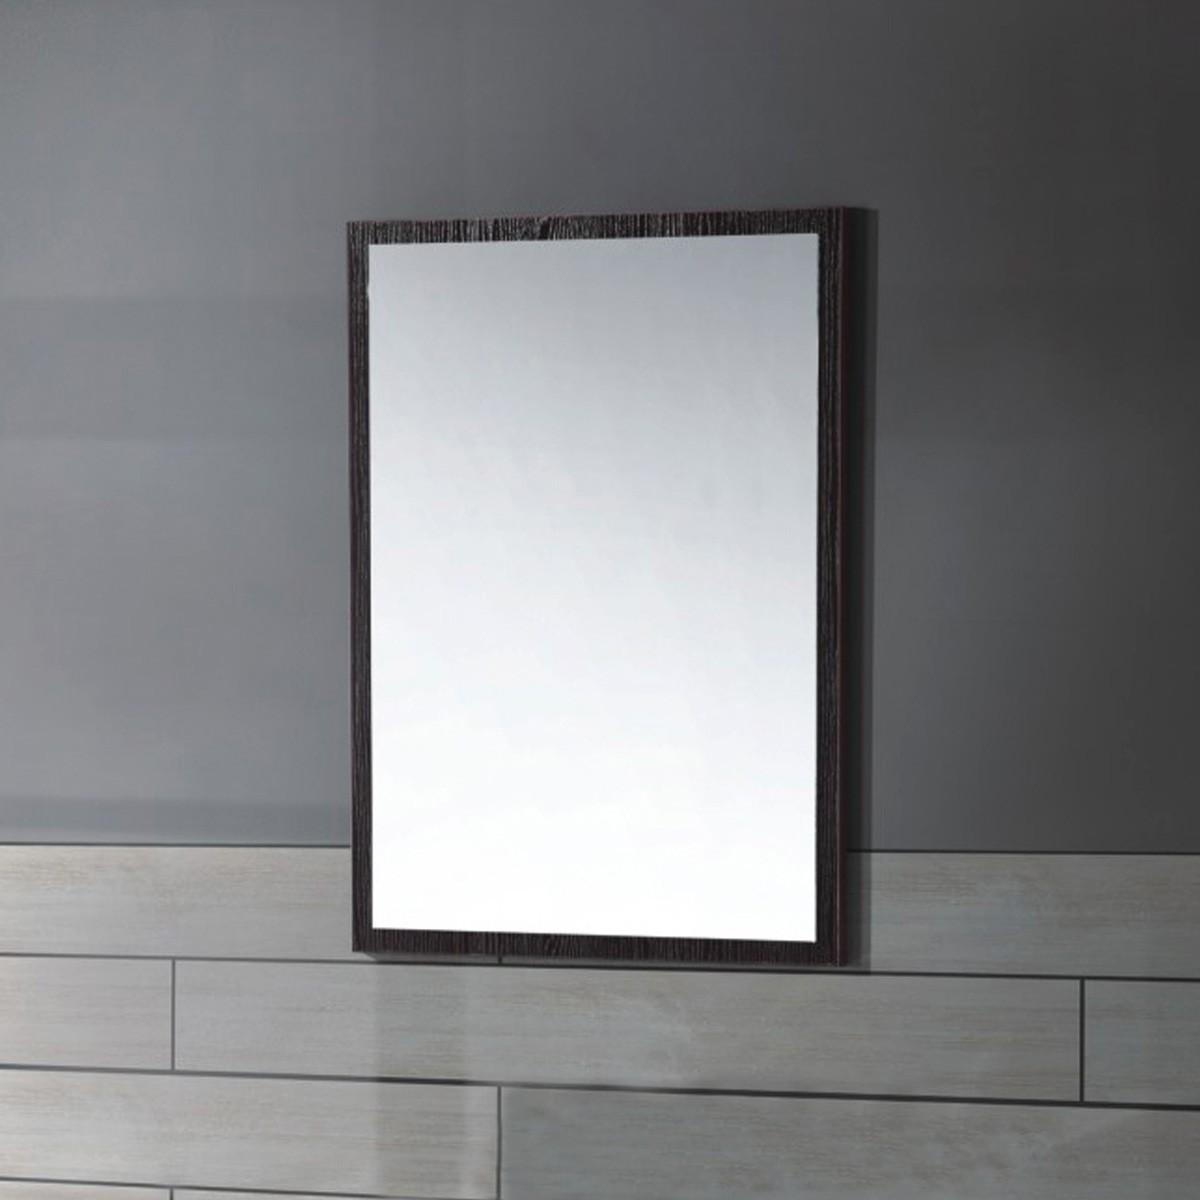 22 x 30 In. Bathroom Vanity Mirror (MG600A-M)